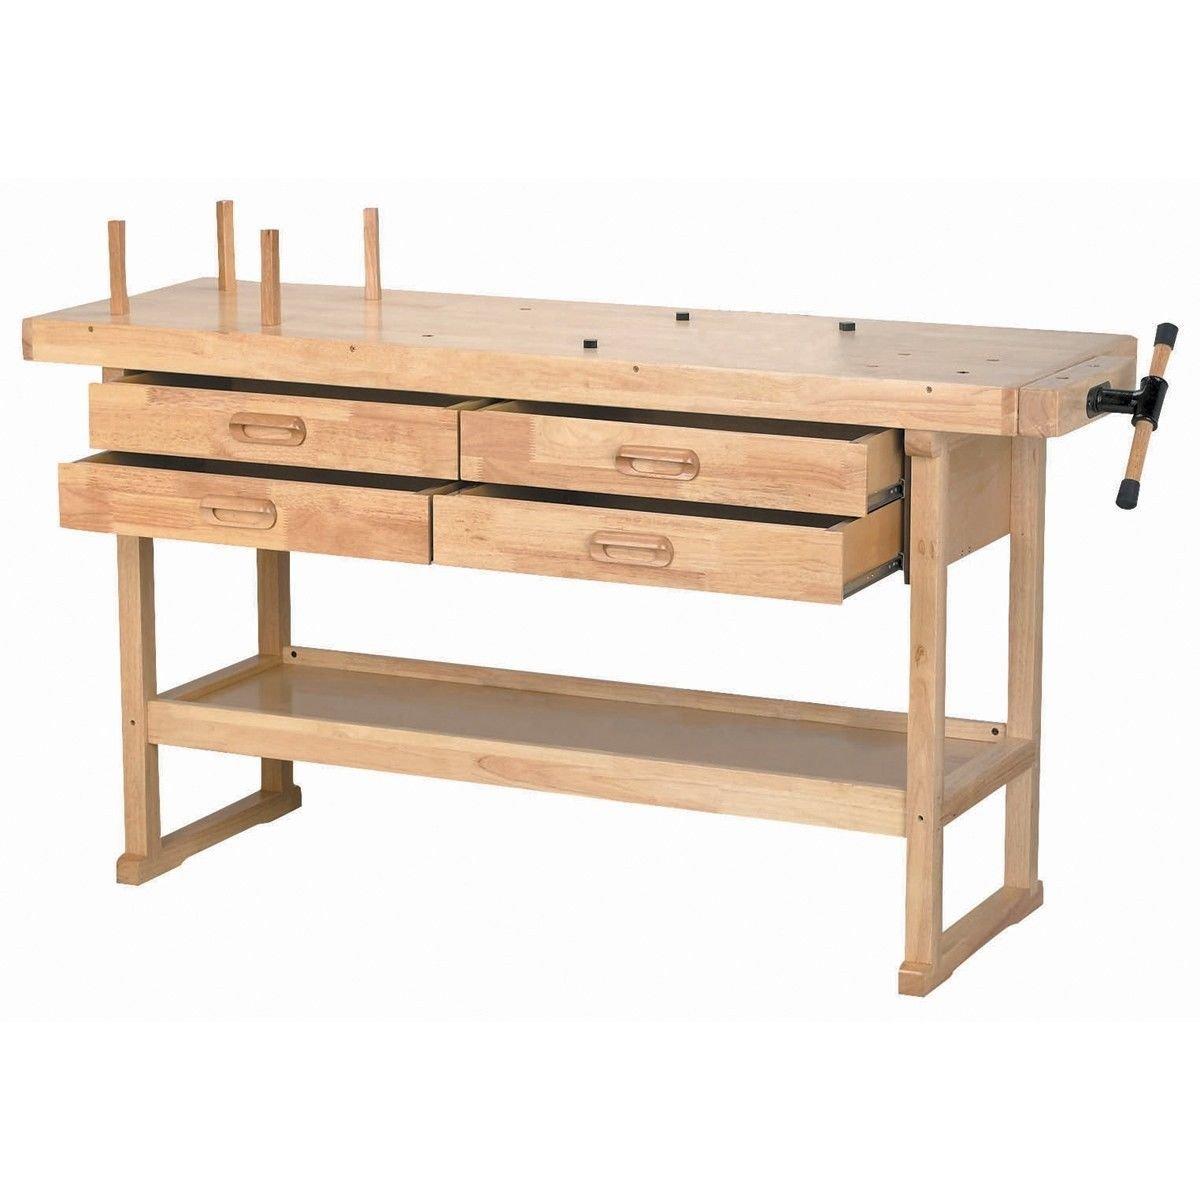 60in Hardwood 5ft Work Bench Shop Table Vice Storage 4 Drawer Tool US Seller